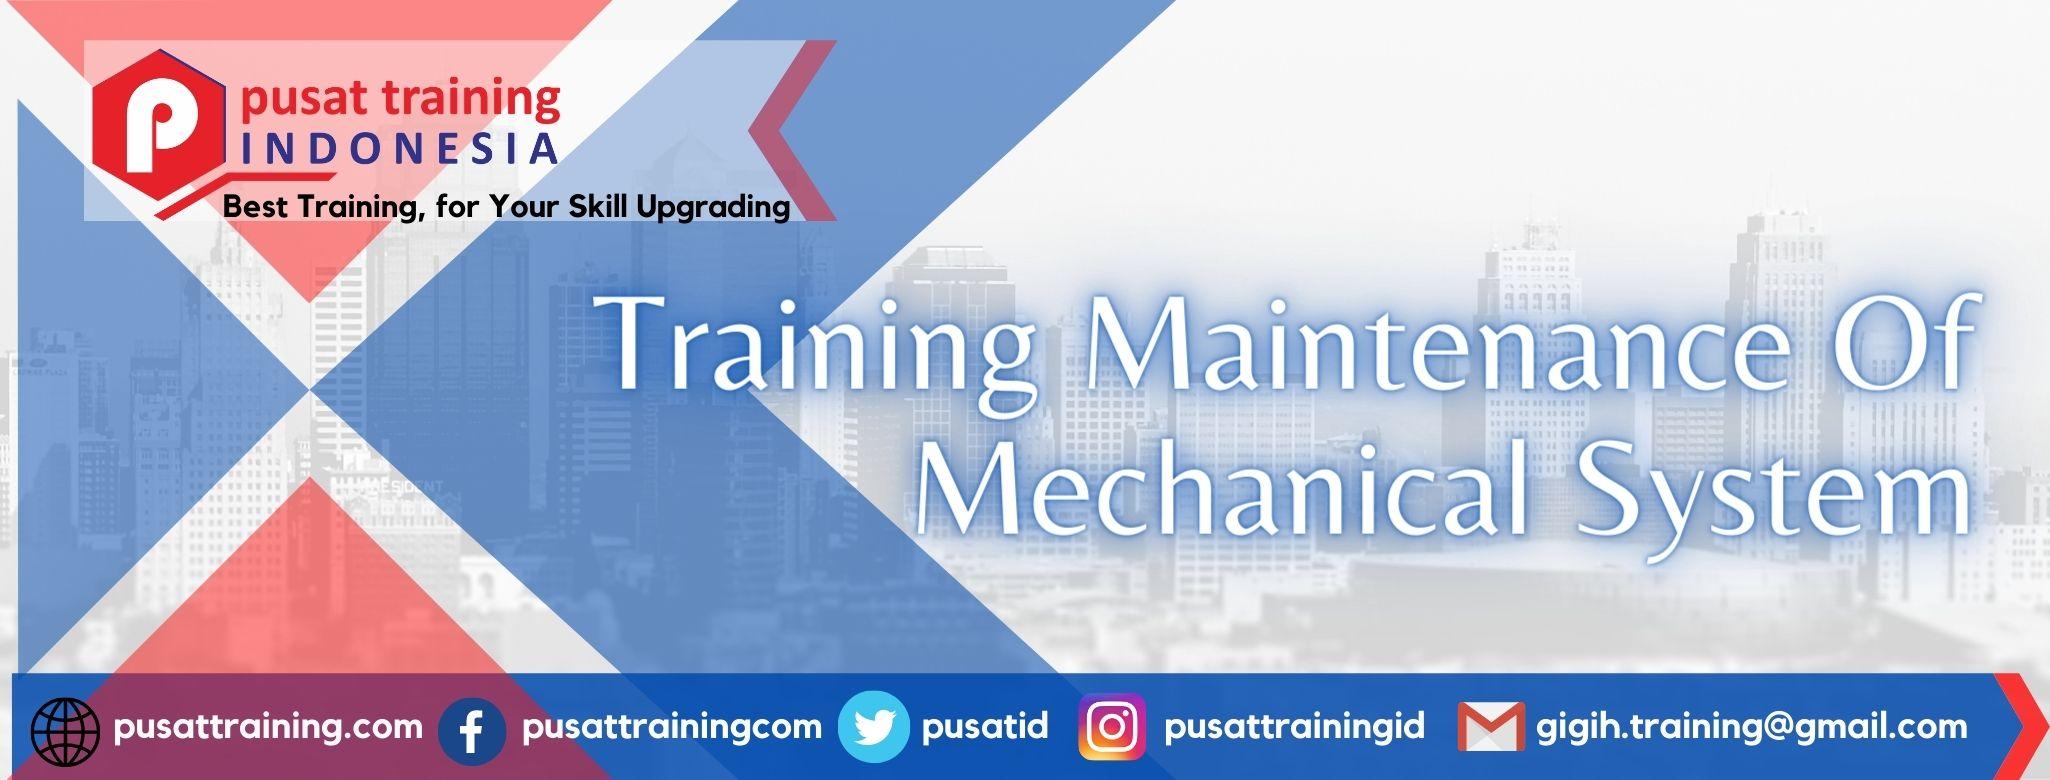 Training Maintenance Of Mechanical System